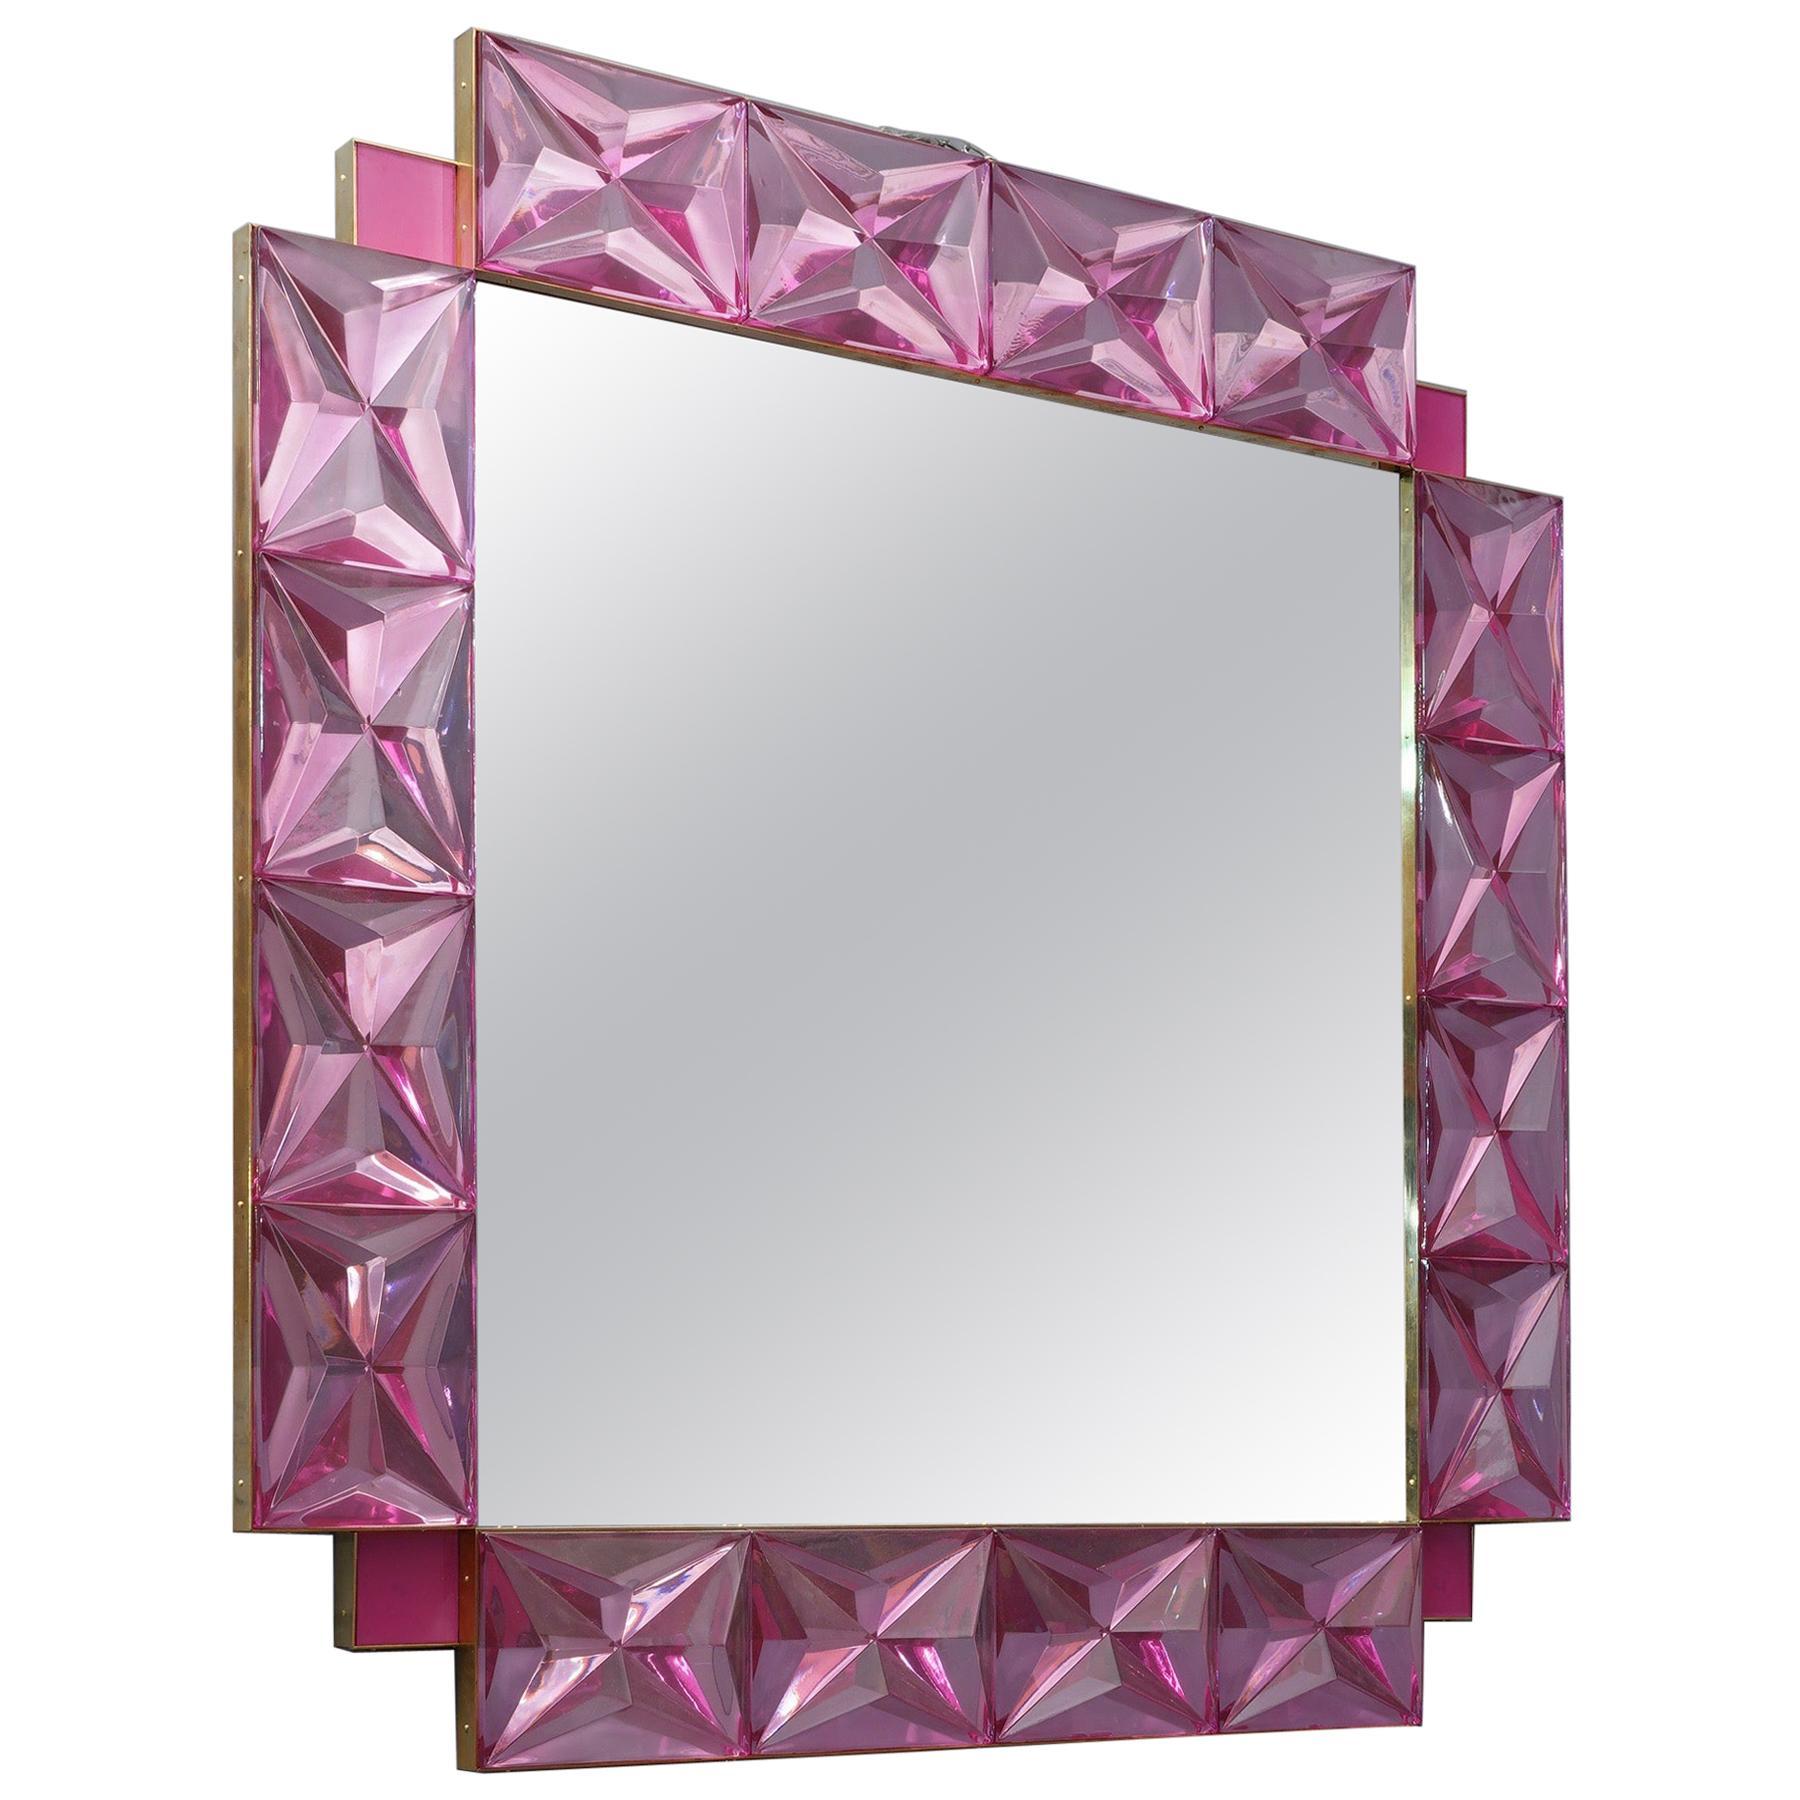 Murano Lively Pink Art Glass Italian Modern Wall Mirror, 2020